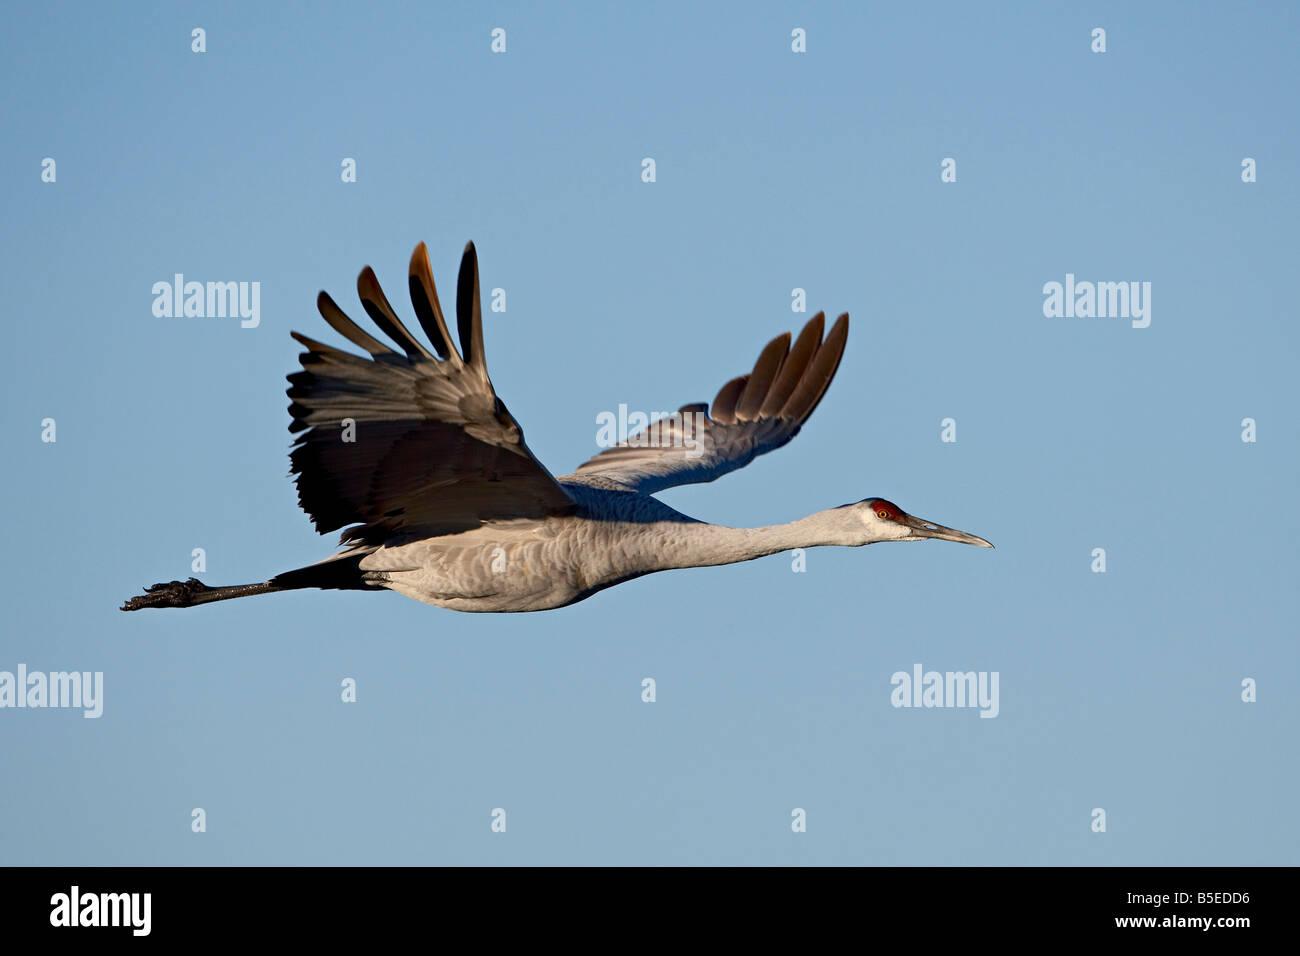 Sandhill crane (Grus canadensis) in flight, Bosque Del Apache National Wildlife Refuge, New Mexico, USA, North America - Stock Image